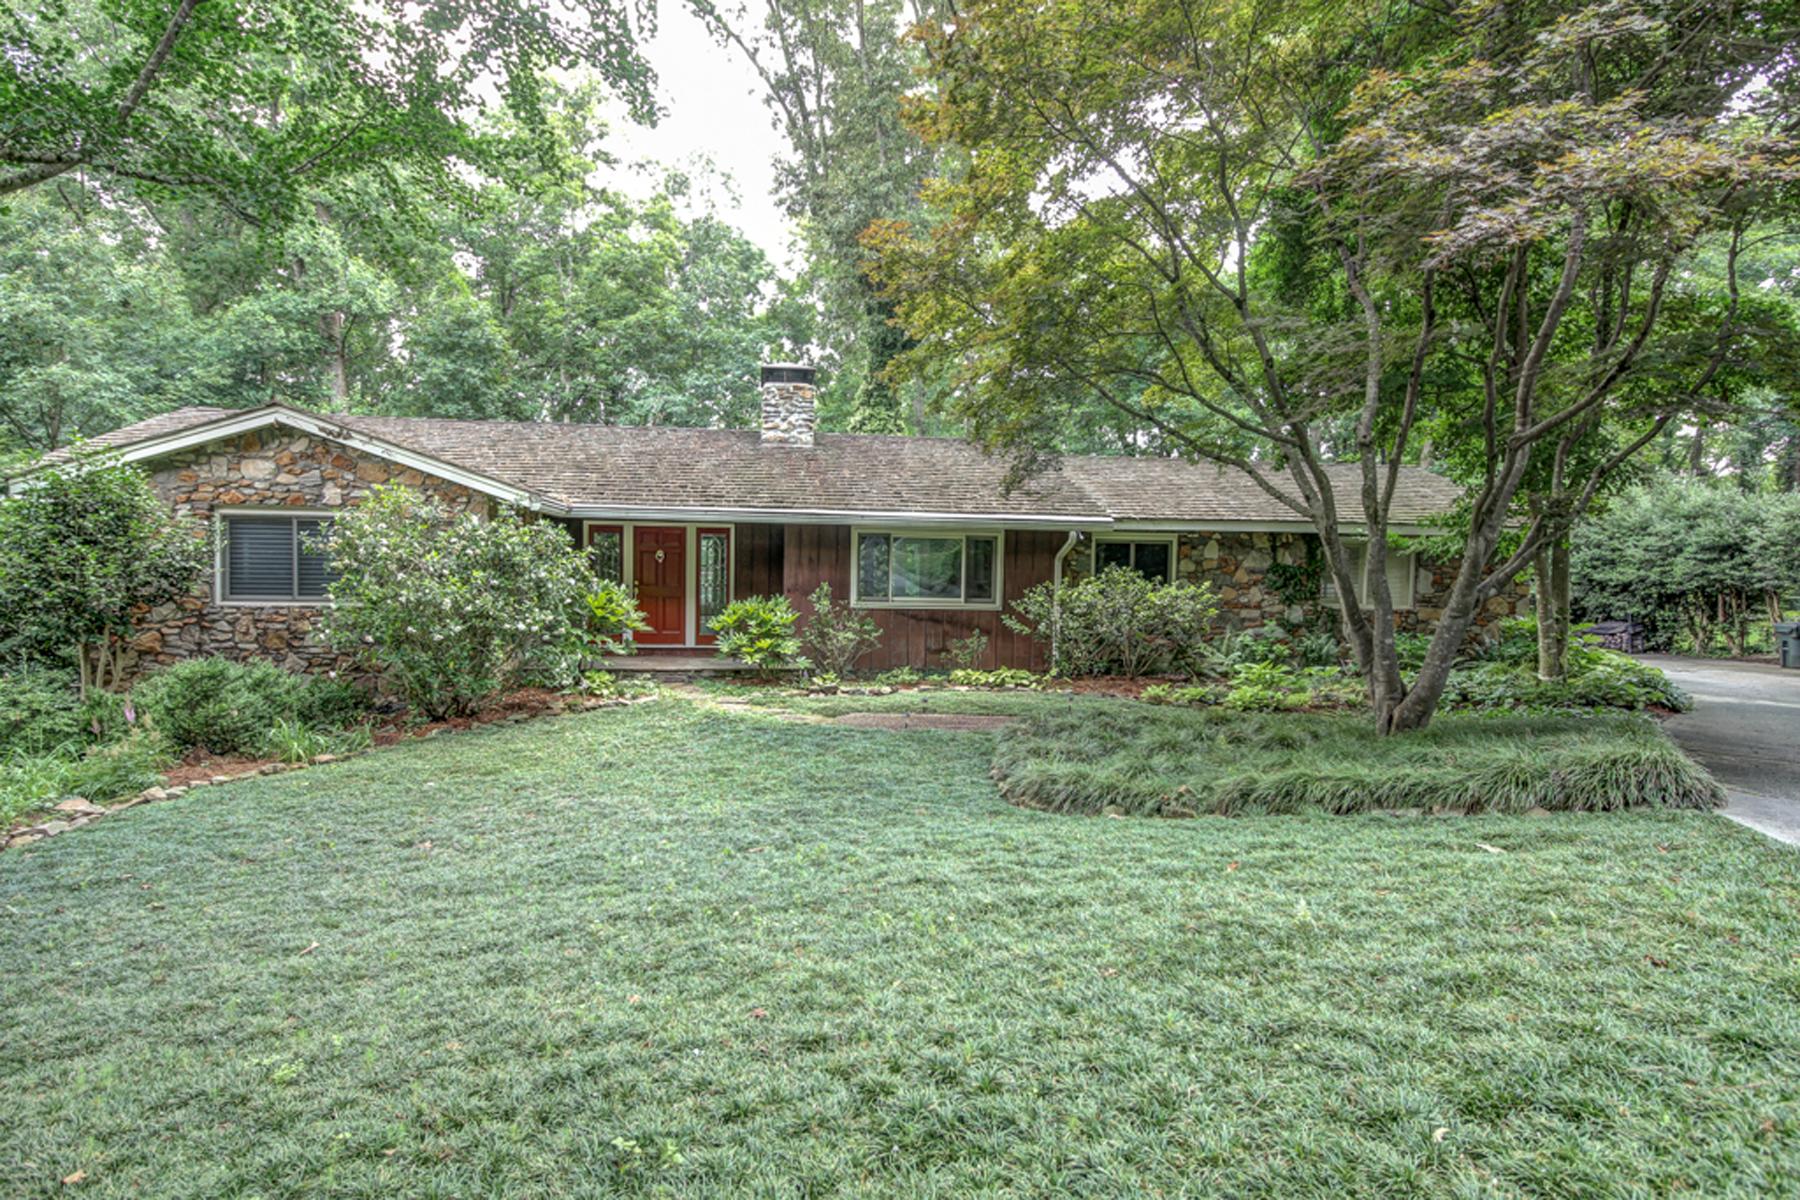 独户住宅 为 销售 在 Mid Century Modern House With Magical Landscaping 860 Edgewater Drive NW Sandy Springs, 乔治亚州 30328 美国